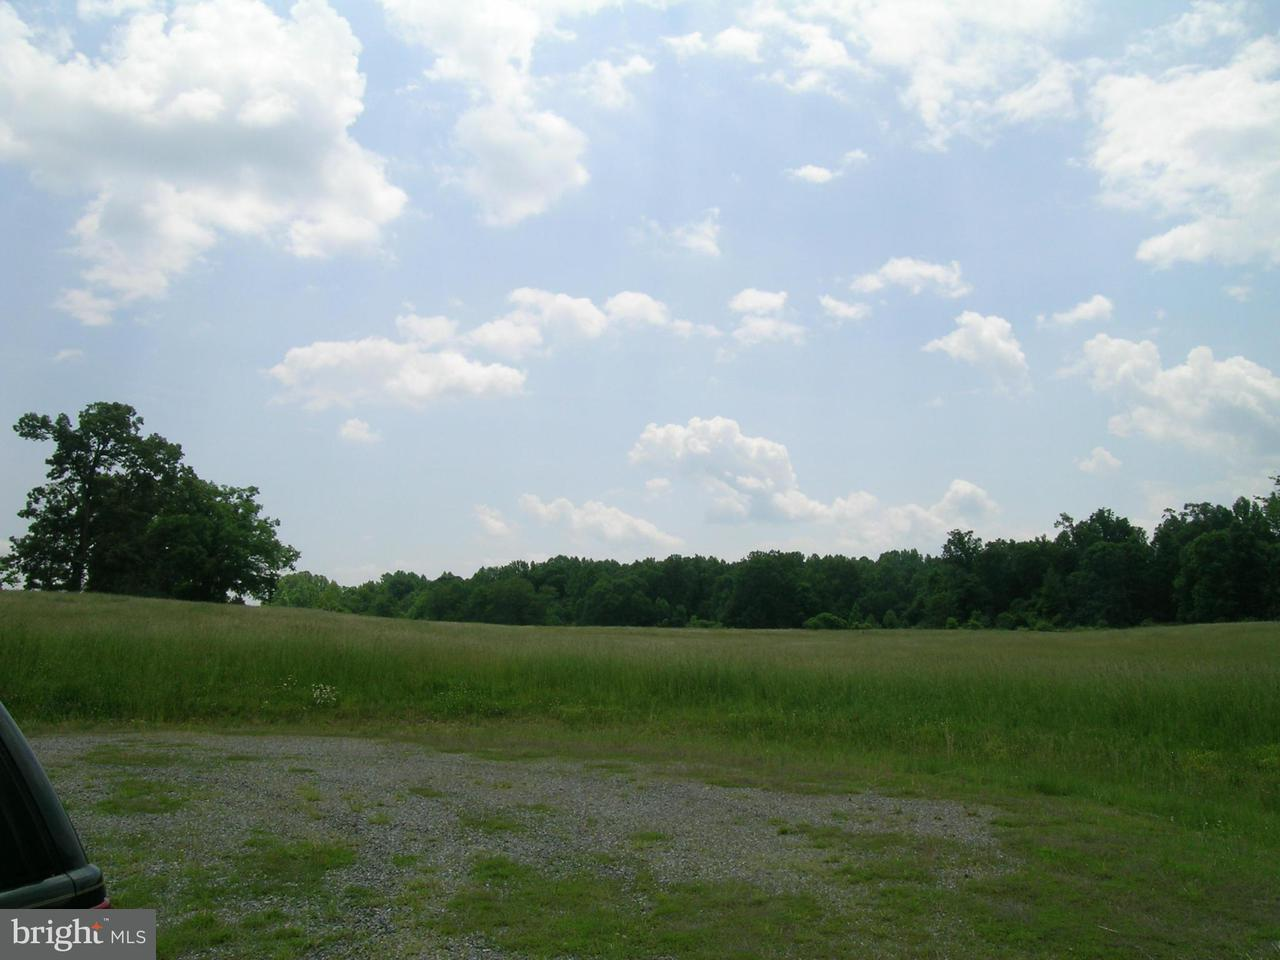 Land for Sale at 4 Aeolian Bumpass, Virginia 23024 United States